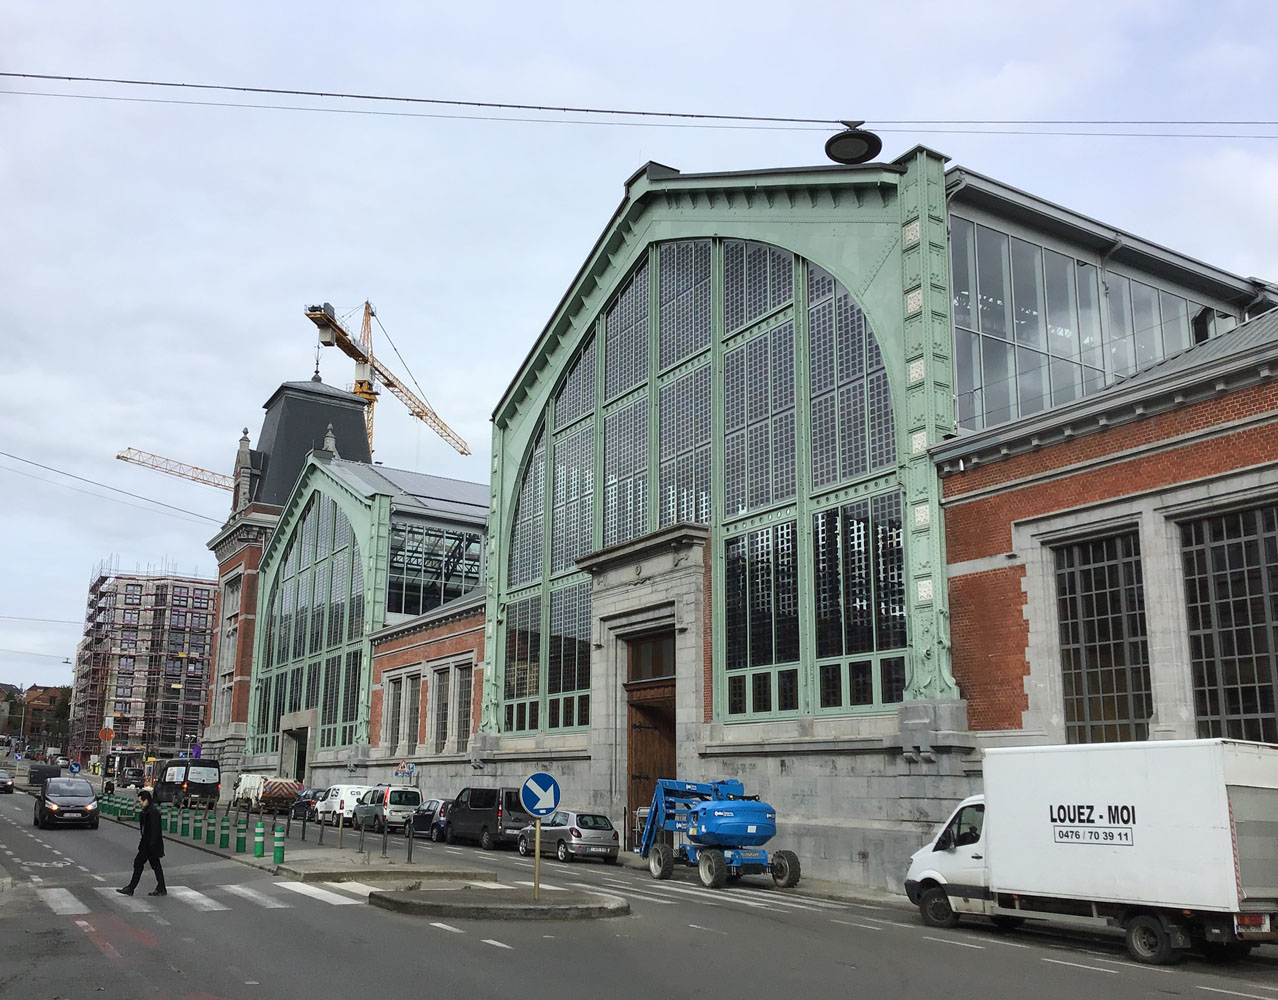 Gare Maritime in Brussel